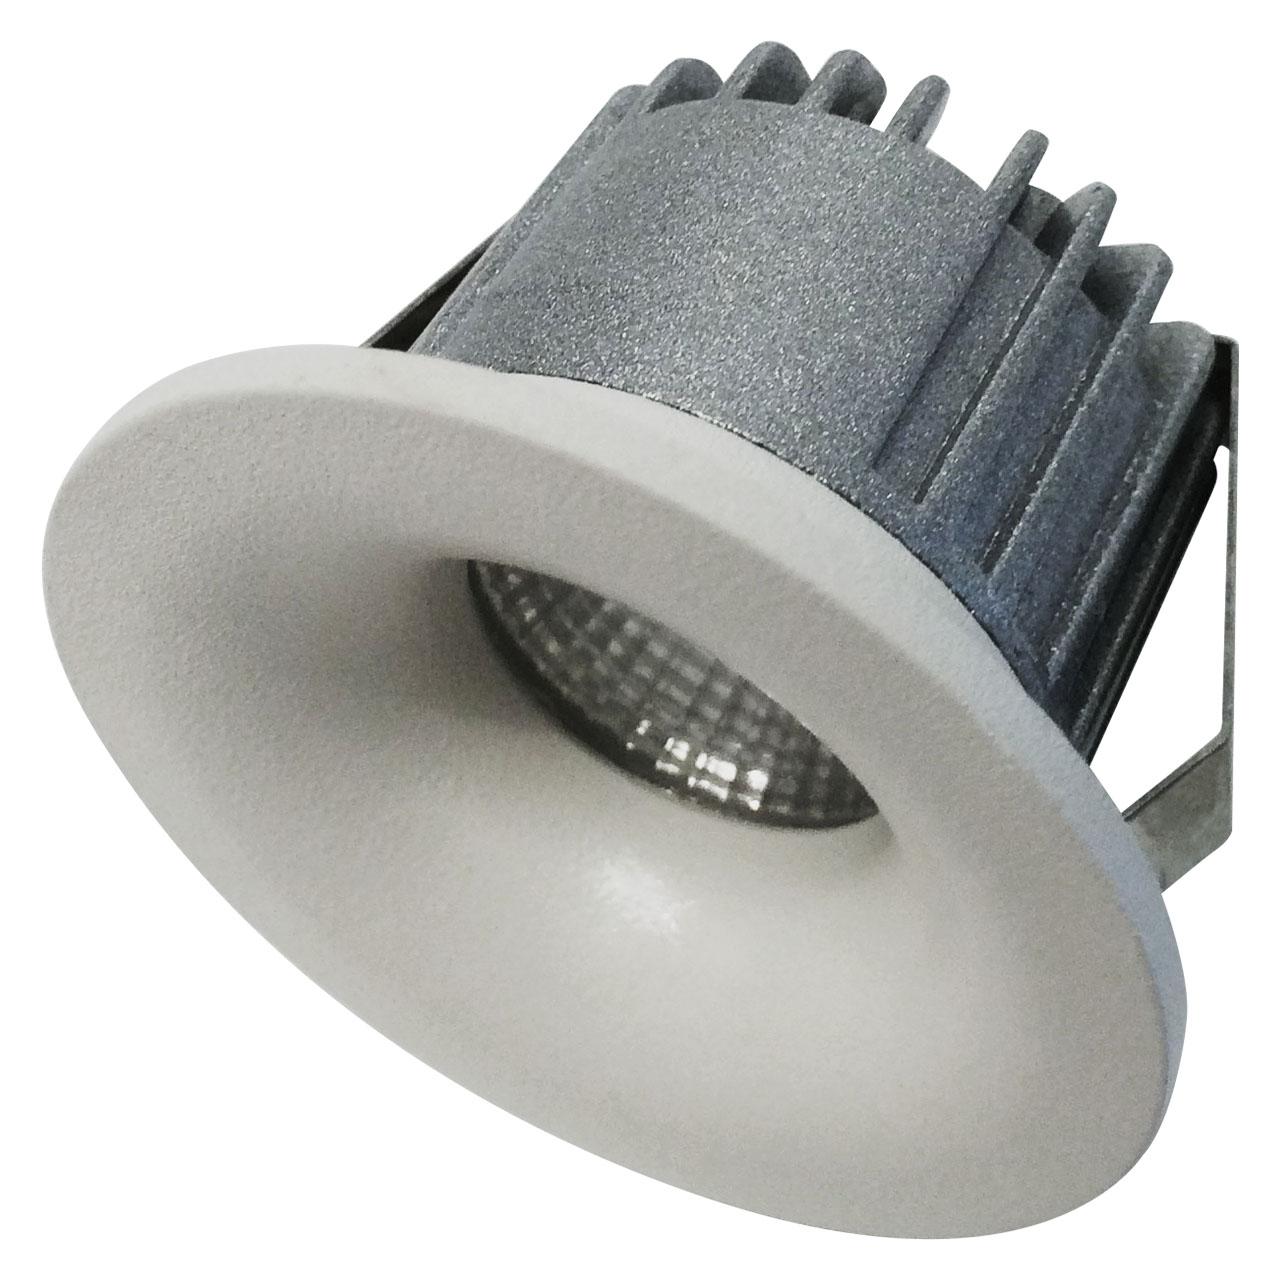 LED Cabinet Light, LED Ceiling Light, LED Recessed Light, ASTEROID_R010, Oasistek